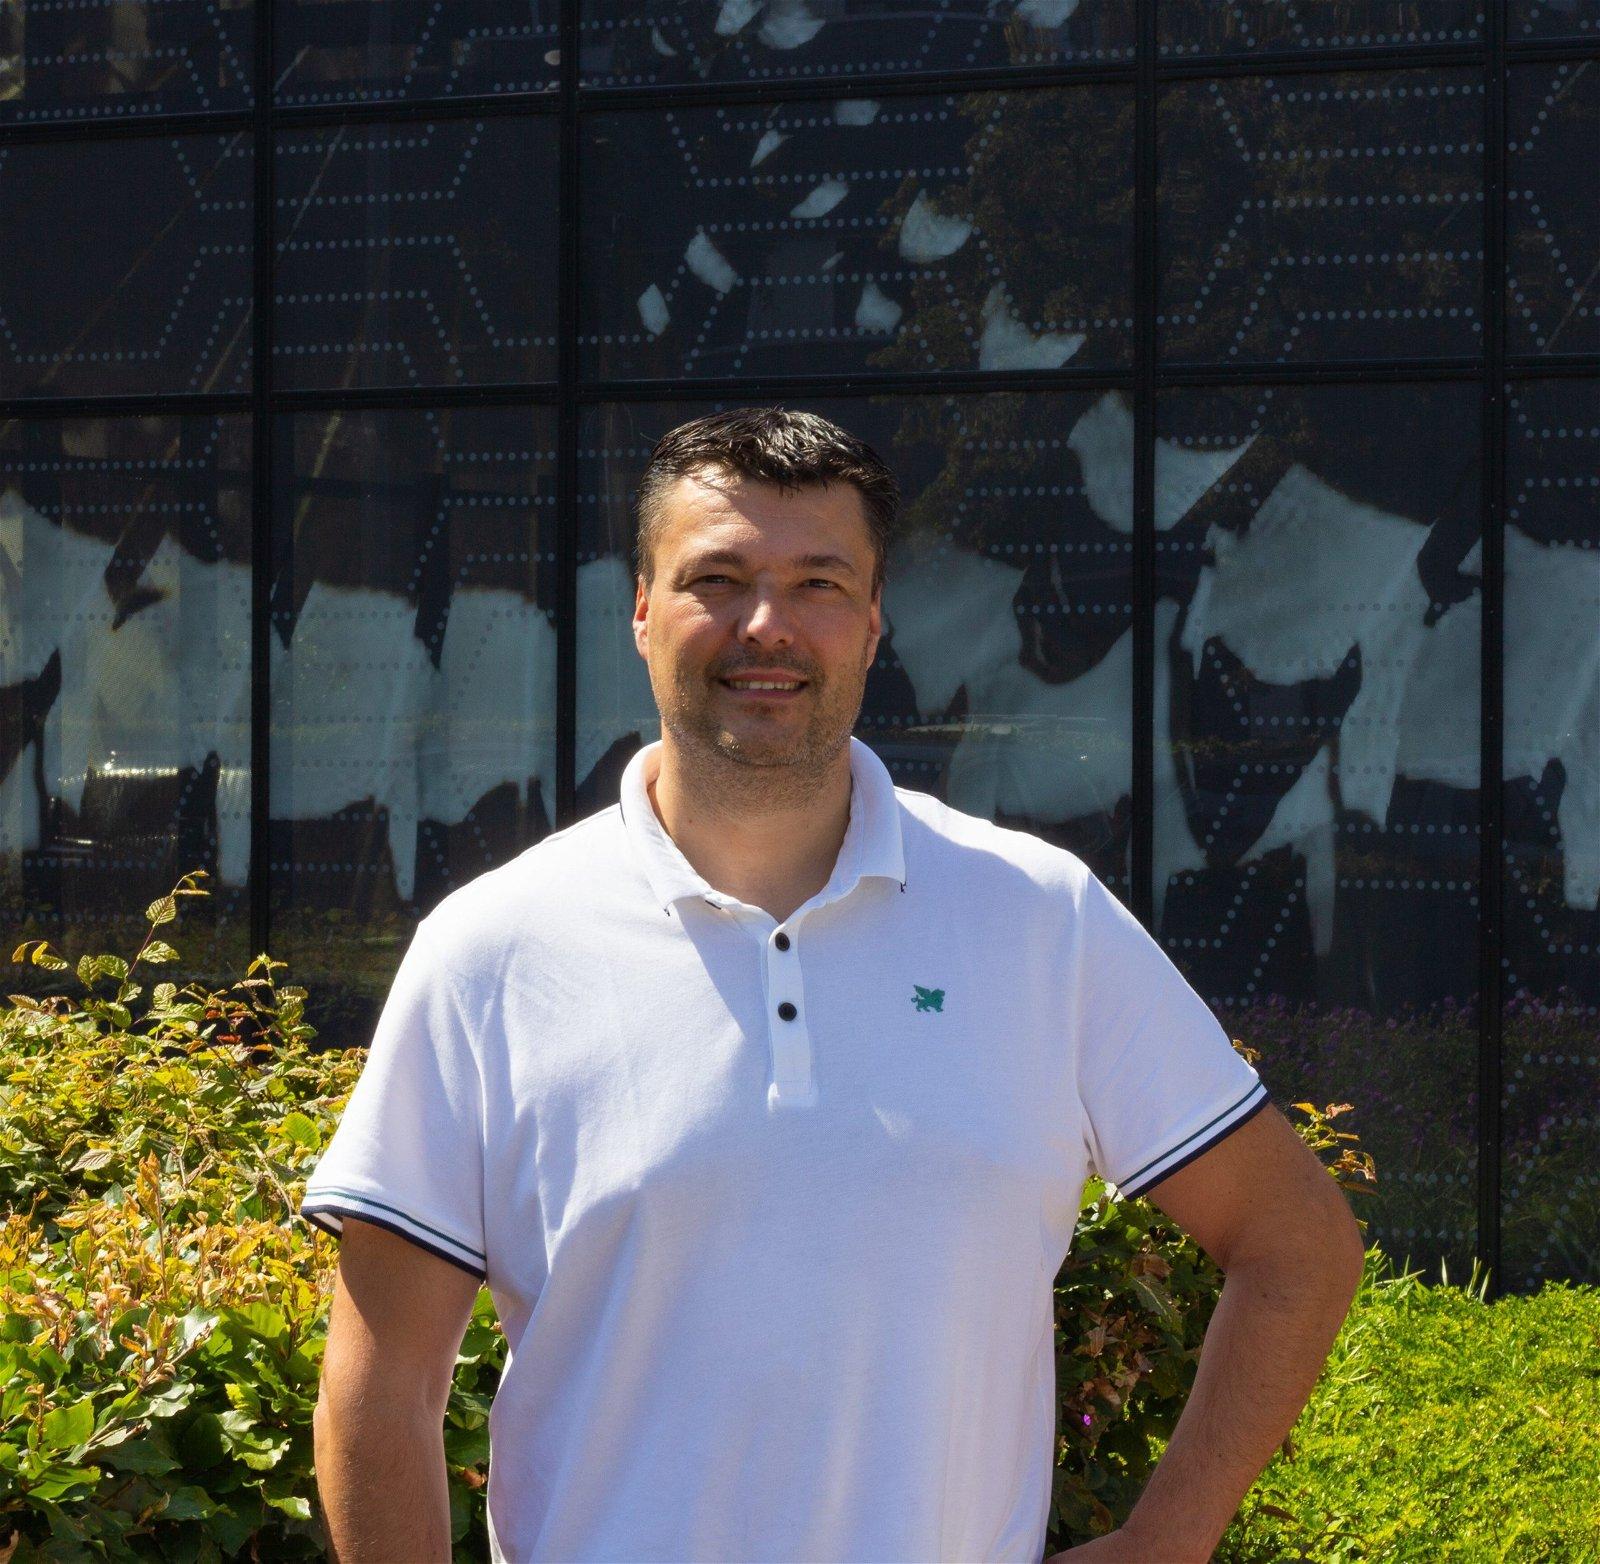 Rob Donkers Projectcoördinator Hoppenbrouwers Techniek Roparun